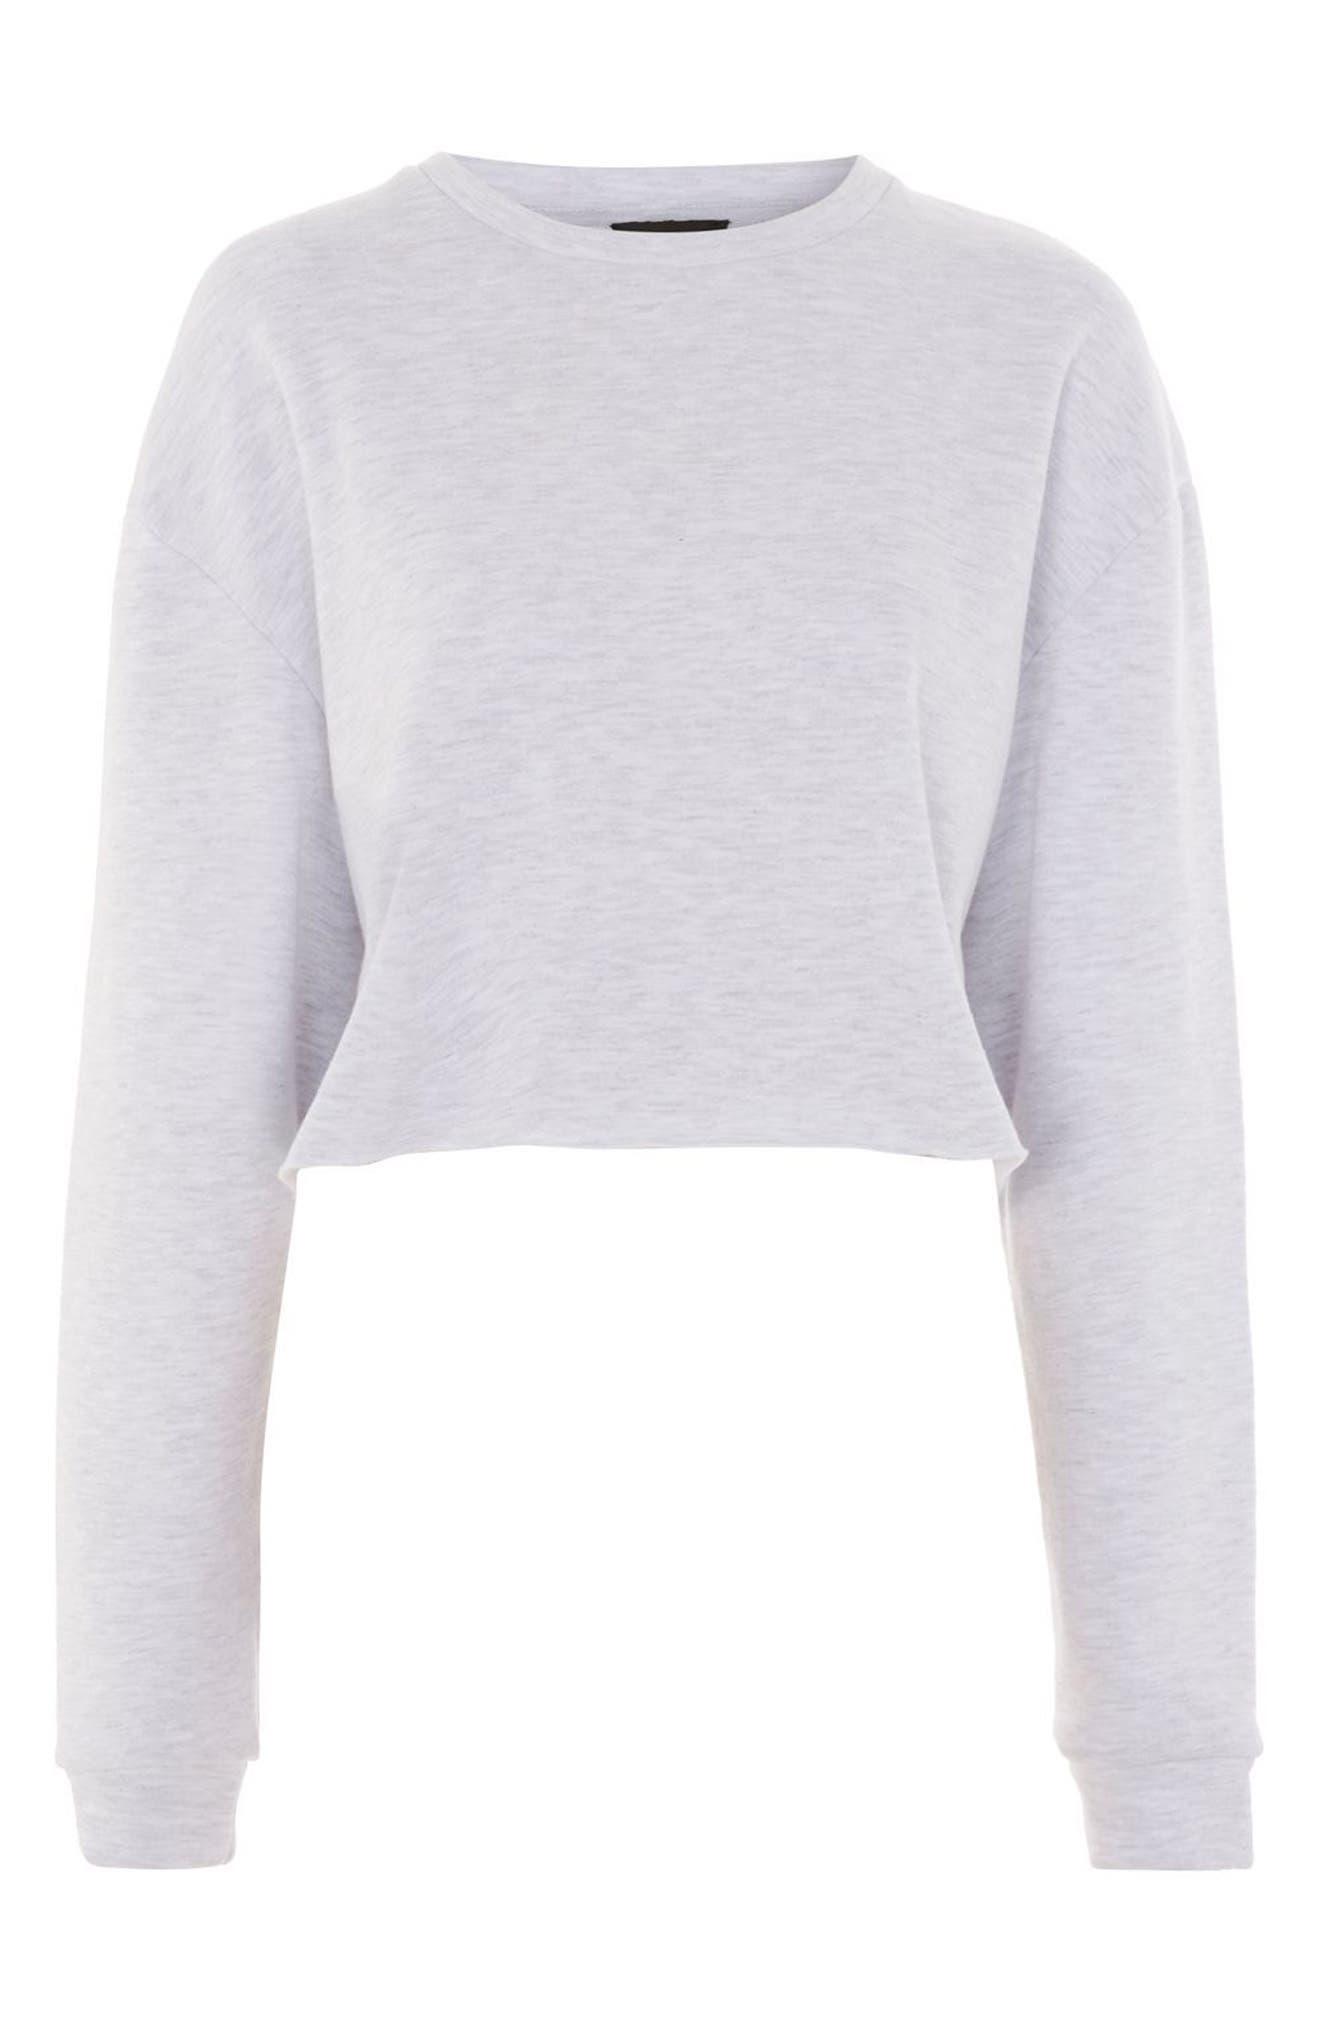 Crop Sweatshirt,                             Alternate thumbnail 3, color,                             GREY MARL